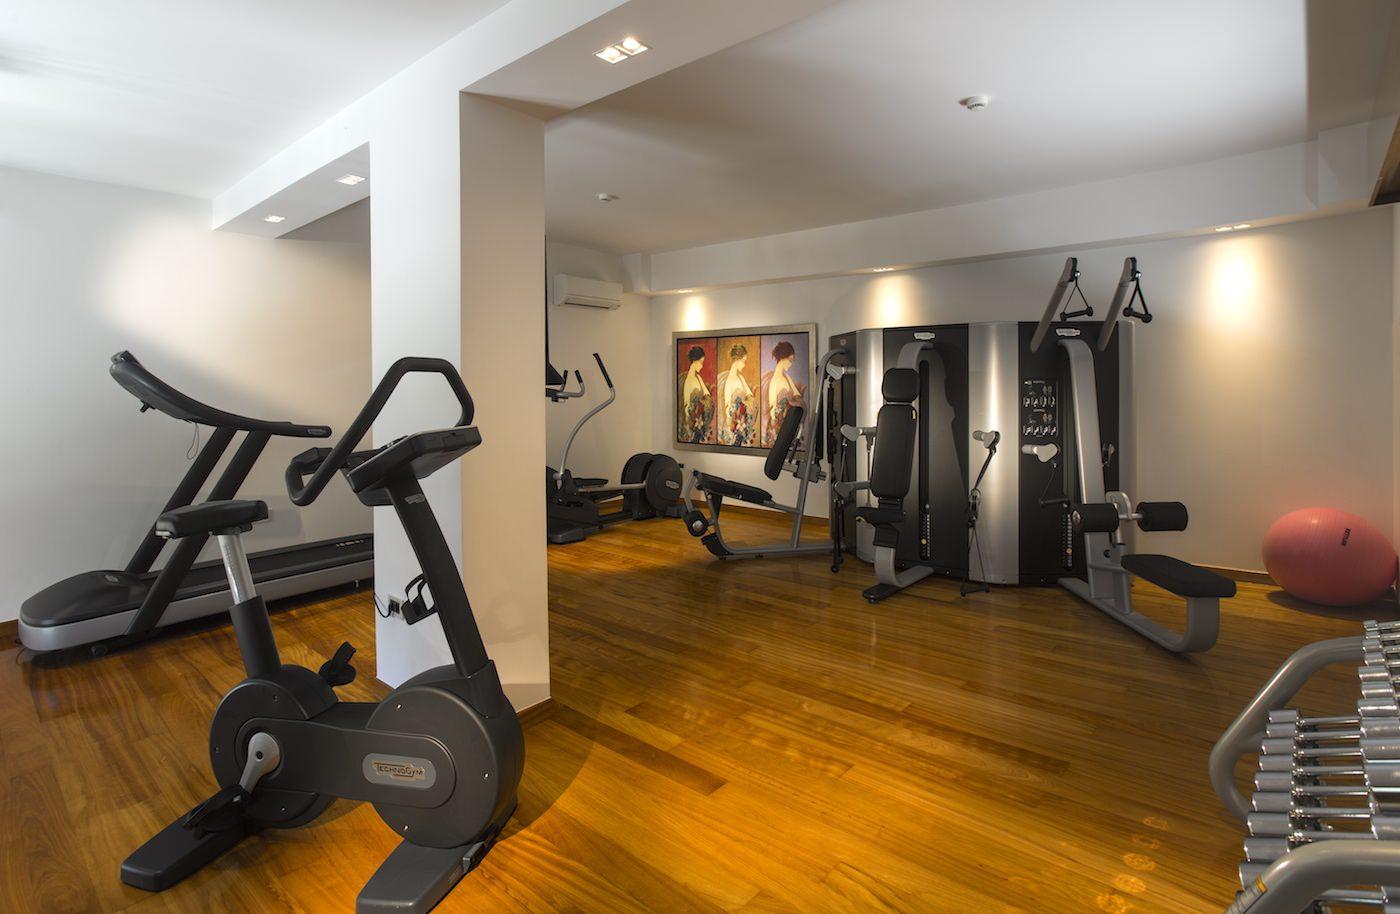 Best Hotel Gym Europe Technogym Greece Personal Training Zakynthos